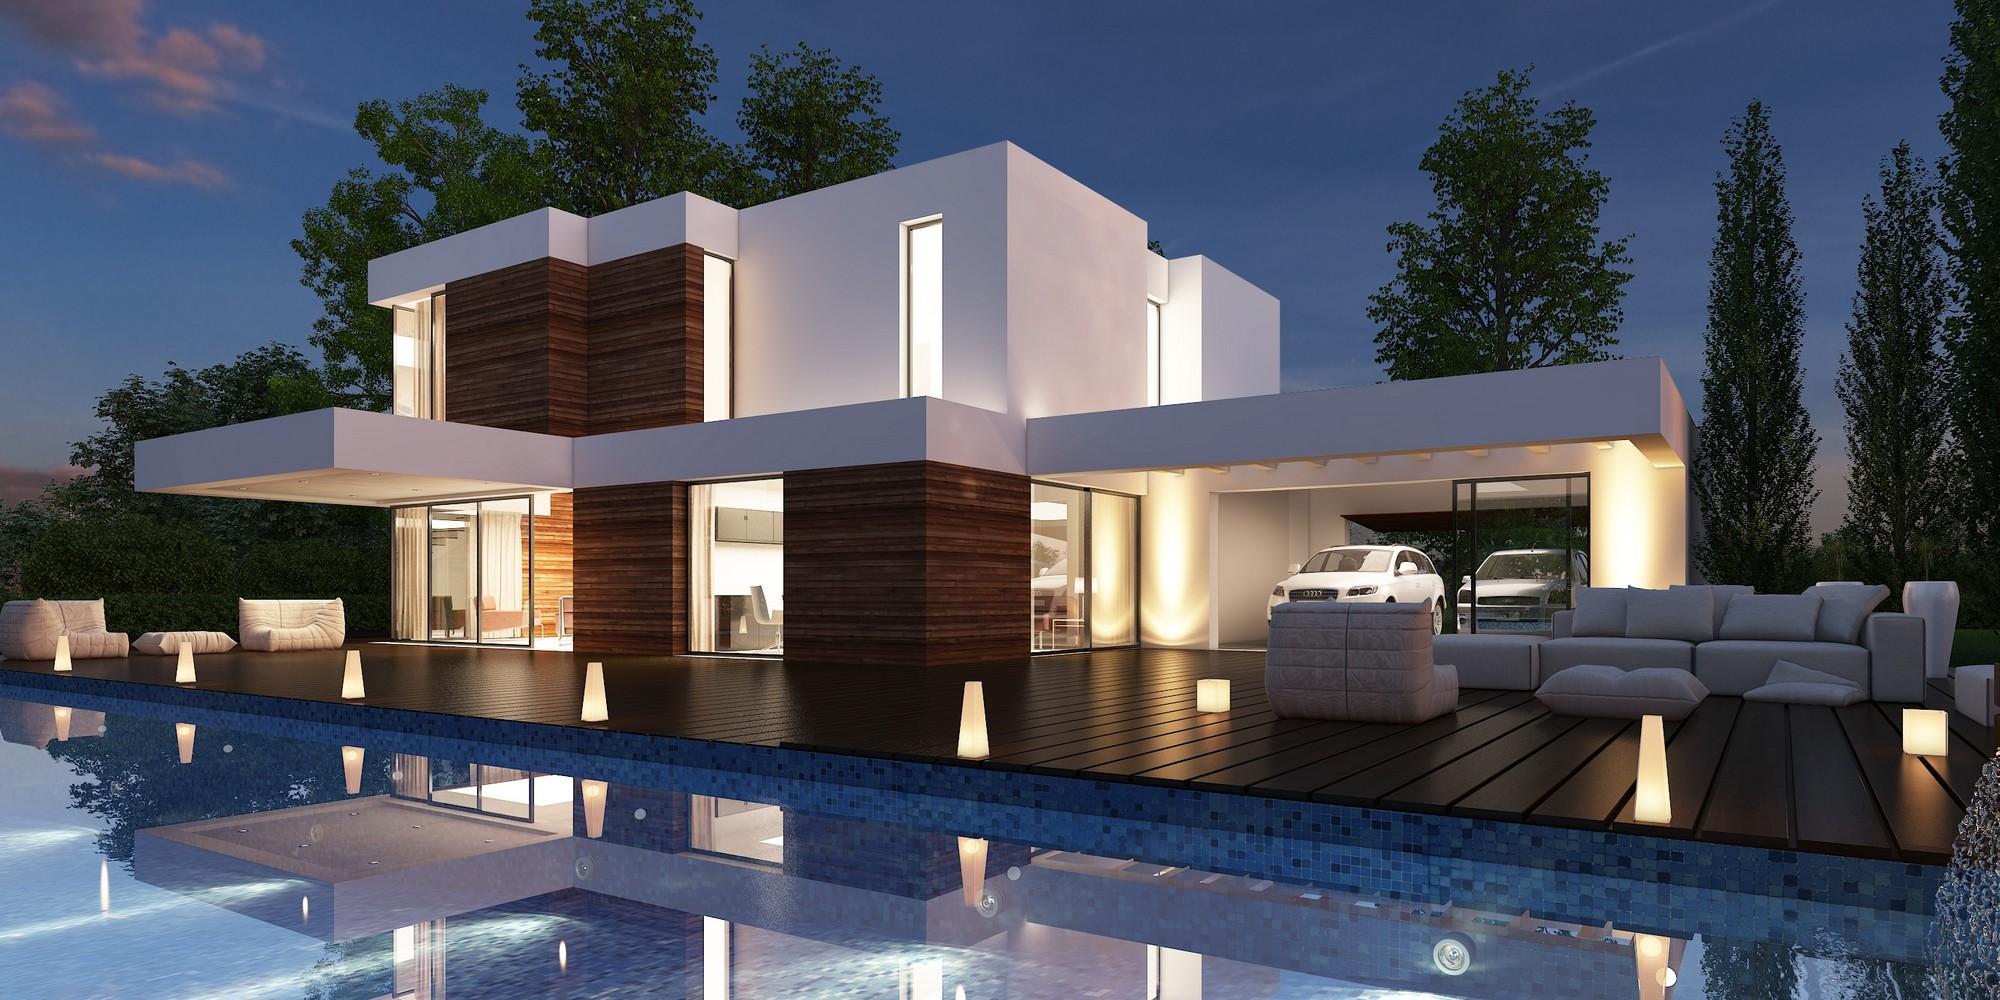 132 casas bonitas modernas fotos lindas - Casas rusticas modernas fotos ...